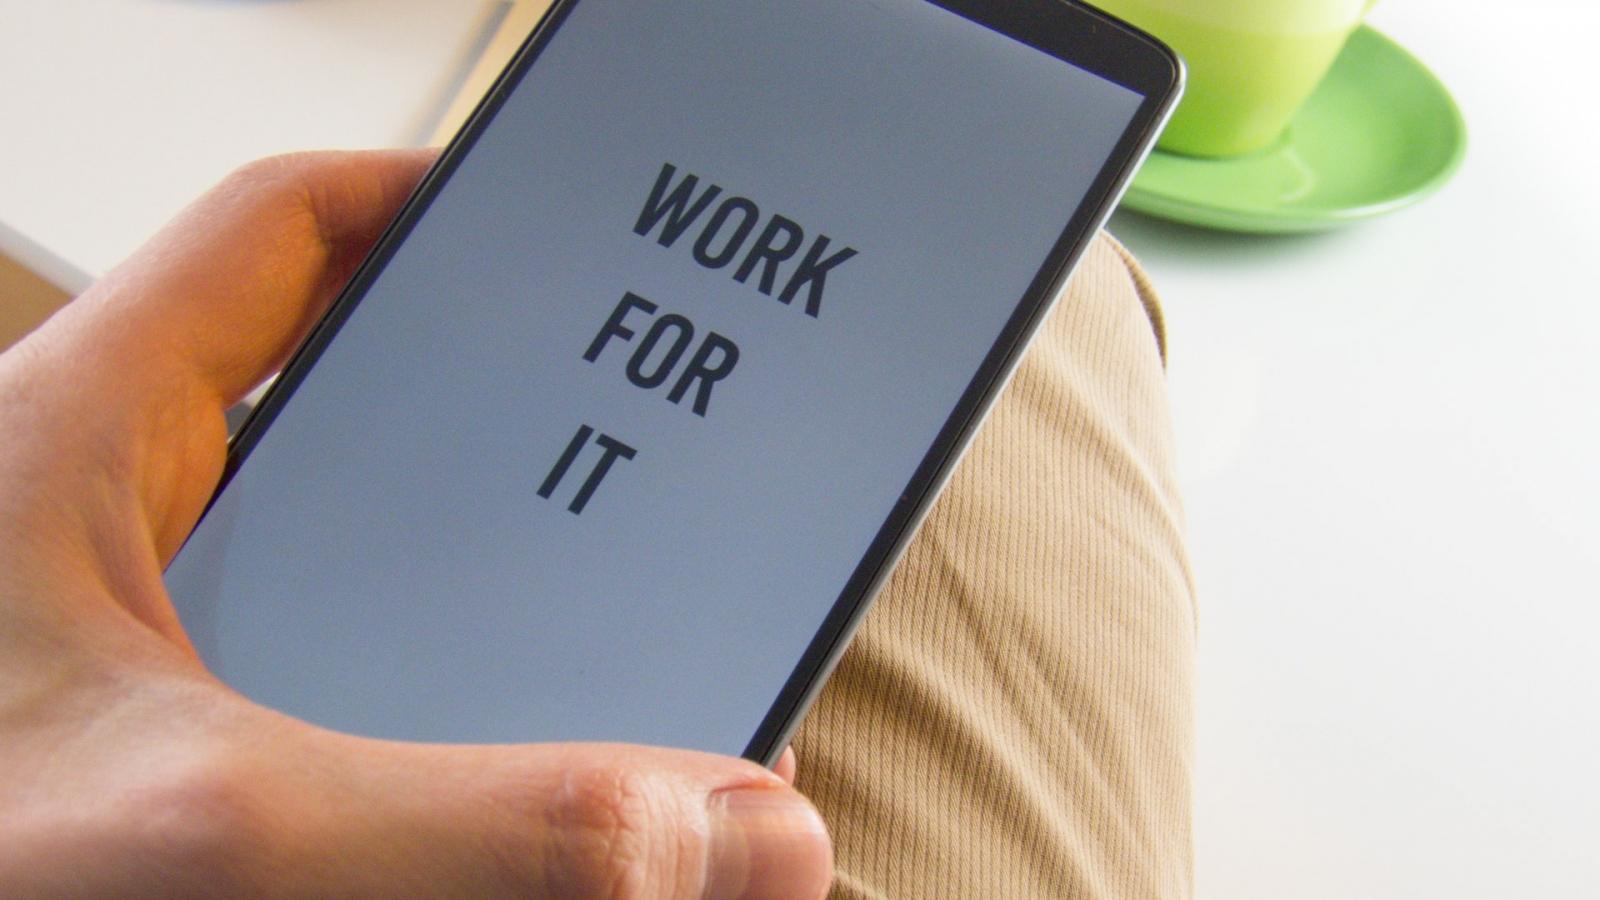 hustle - work